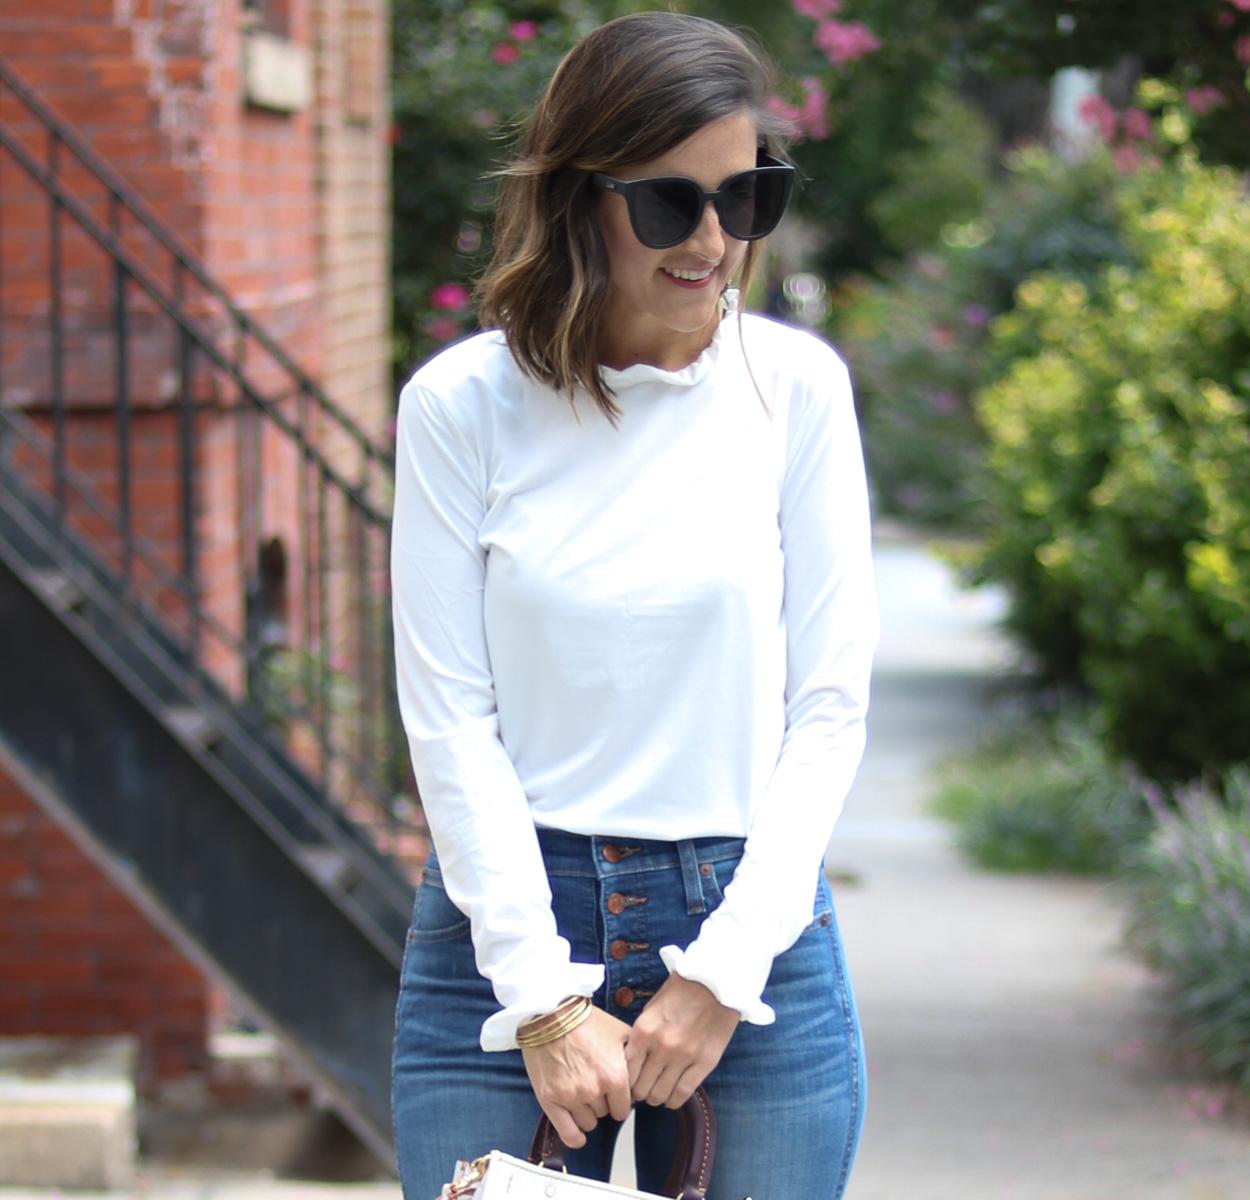 SoSis Boutique White Ruffle Top by popular Washington DC fashion blogger Cobalt Chronicles